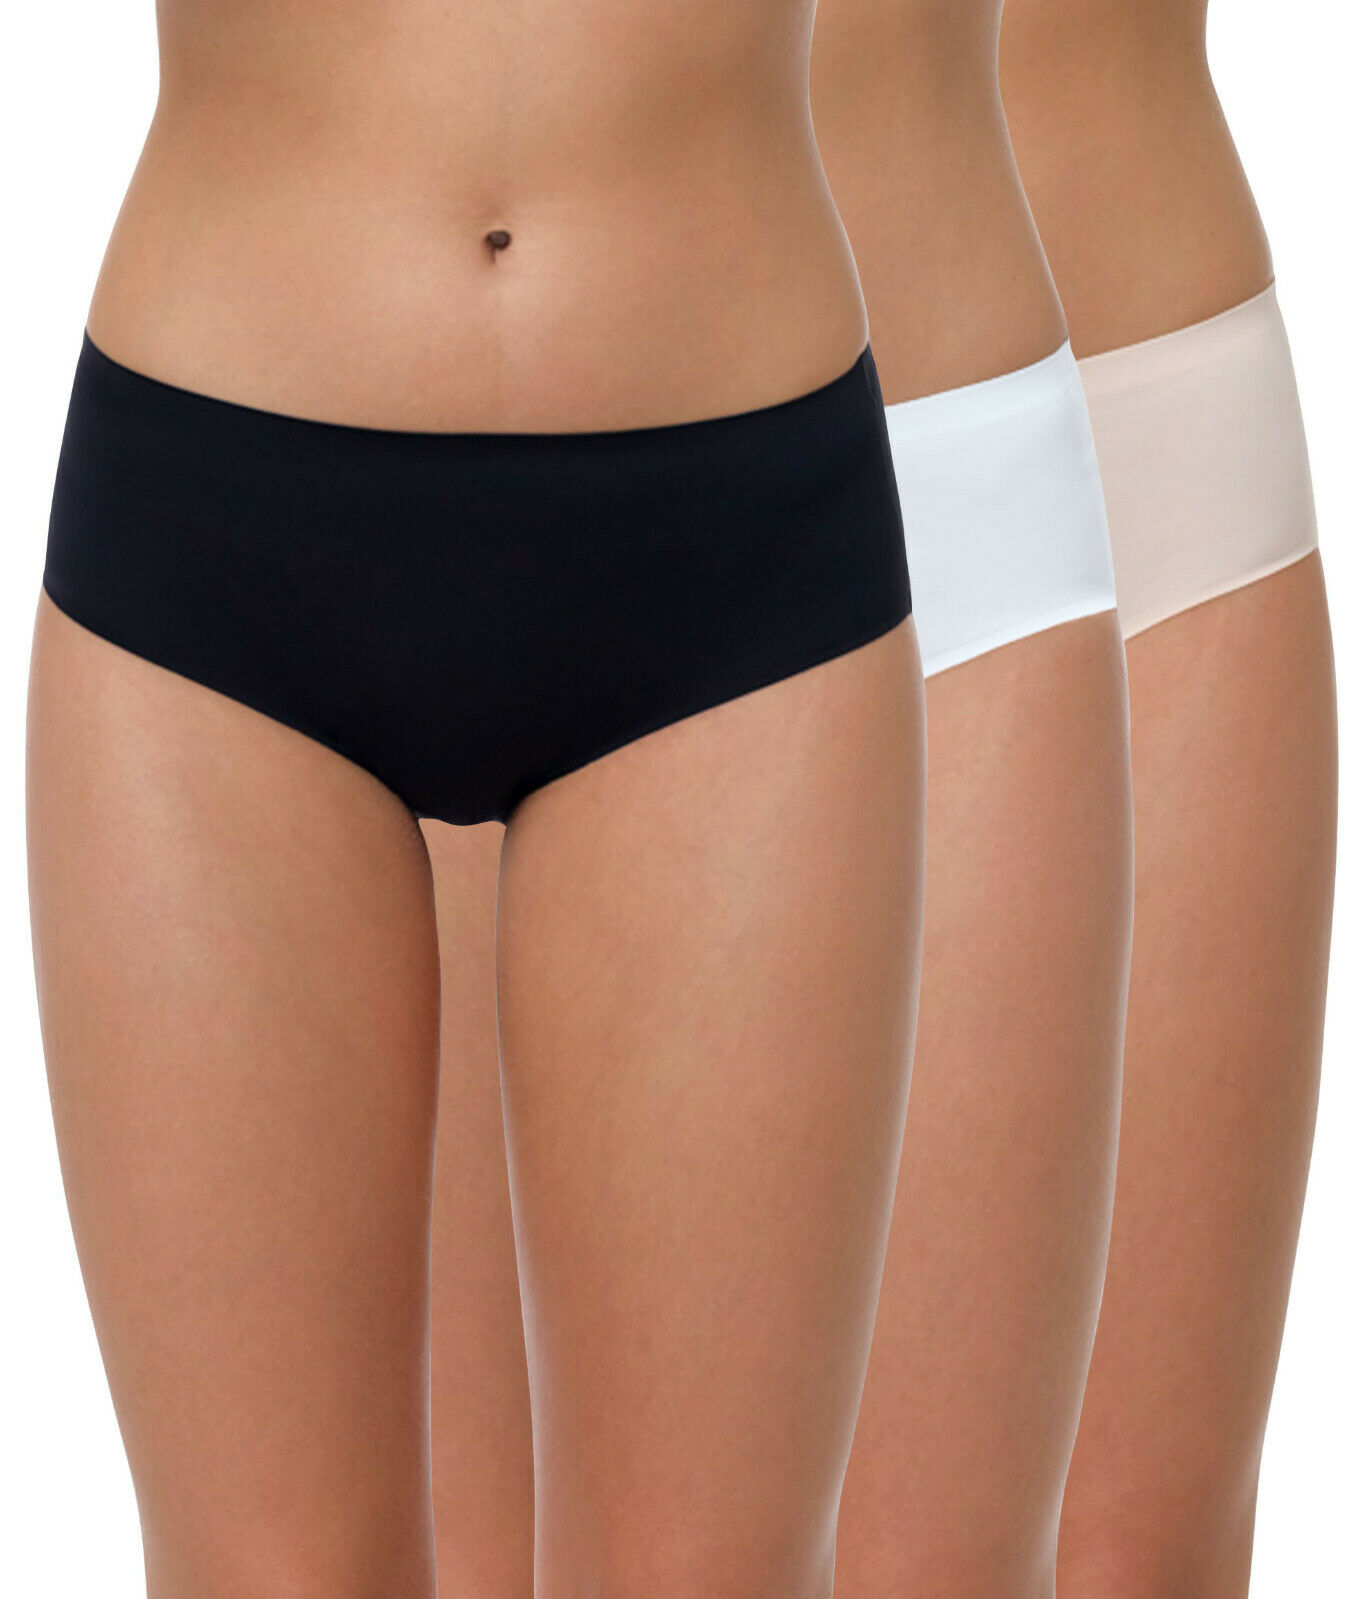 Damen Slips, Hüftslip, Nahtlose Slips, Mikrofaser Hipster ohne Nähte